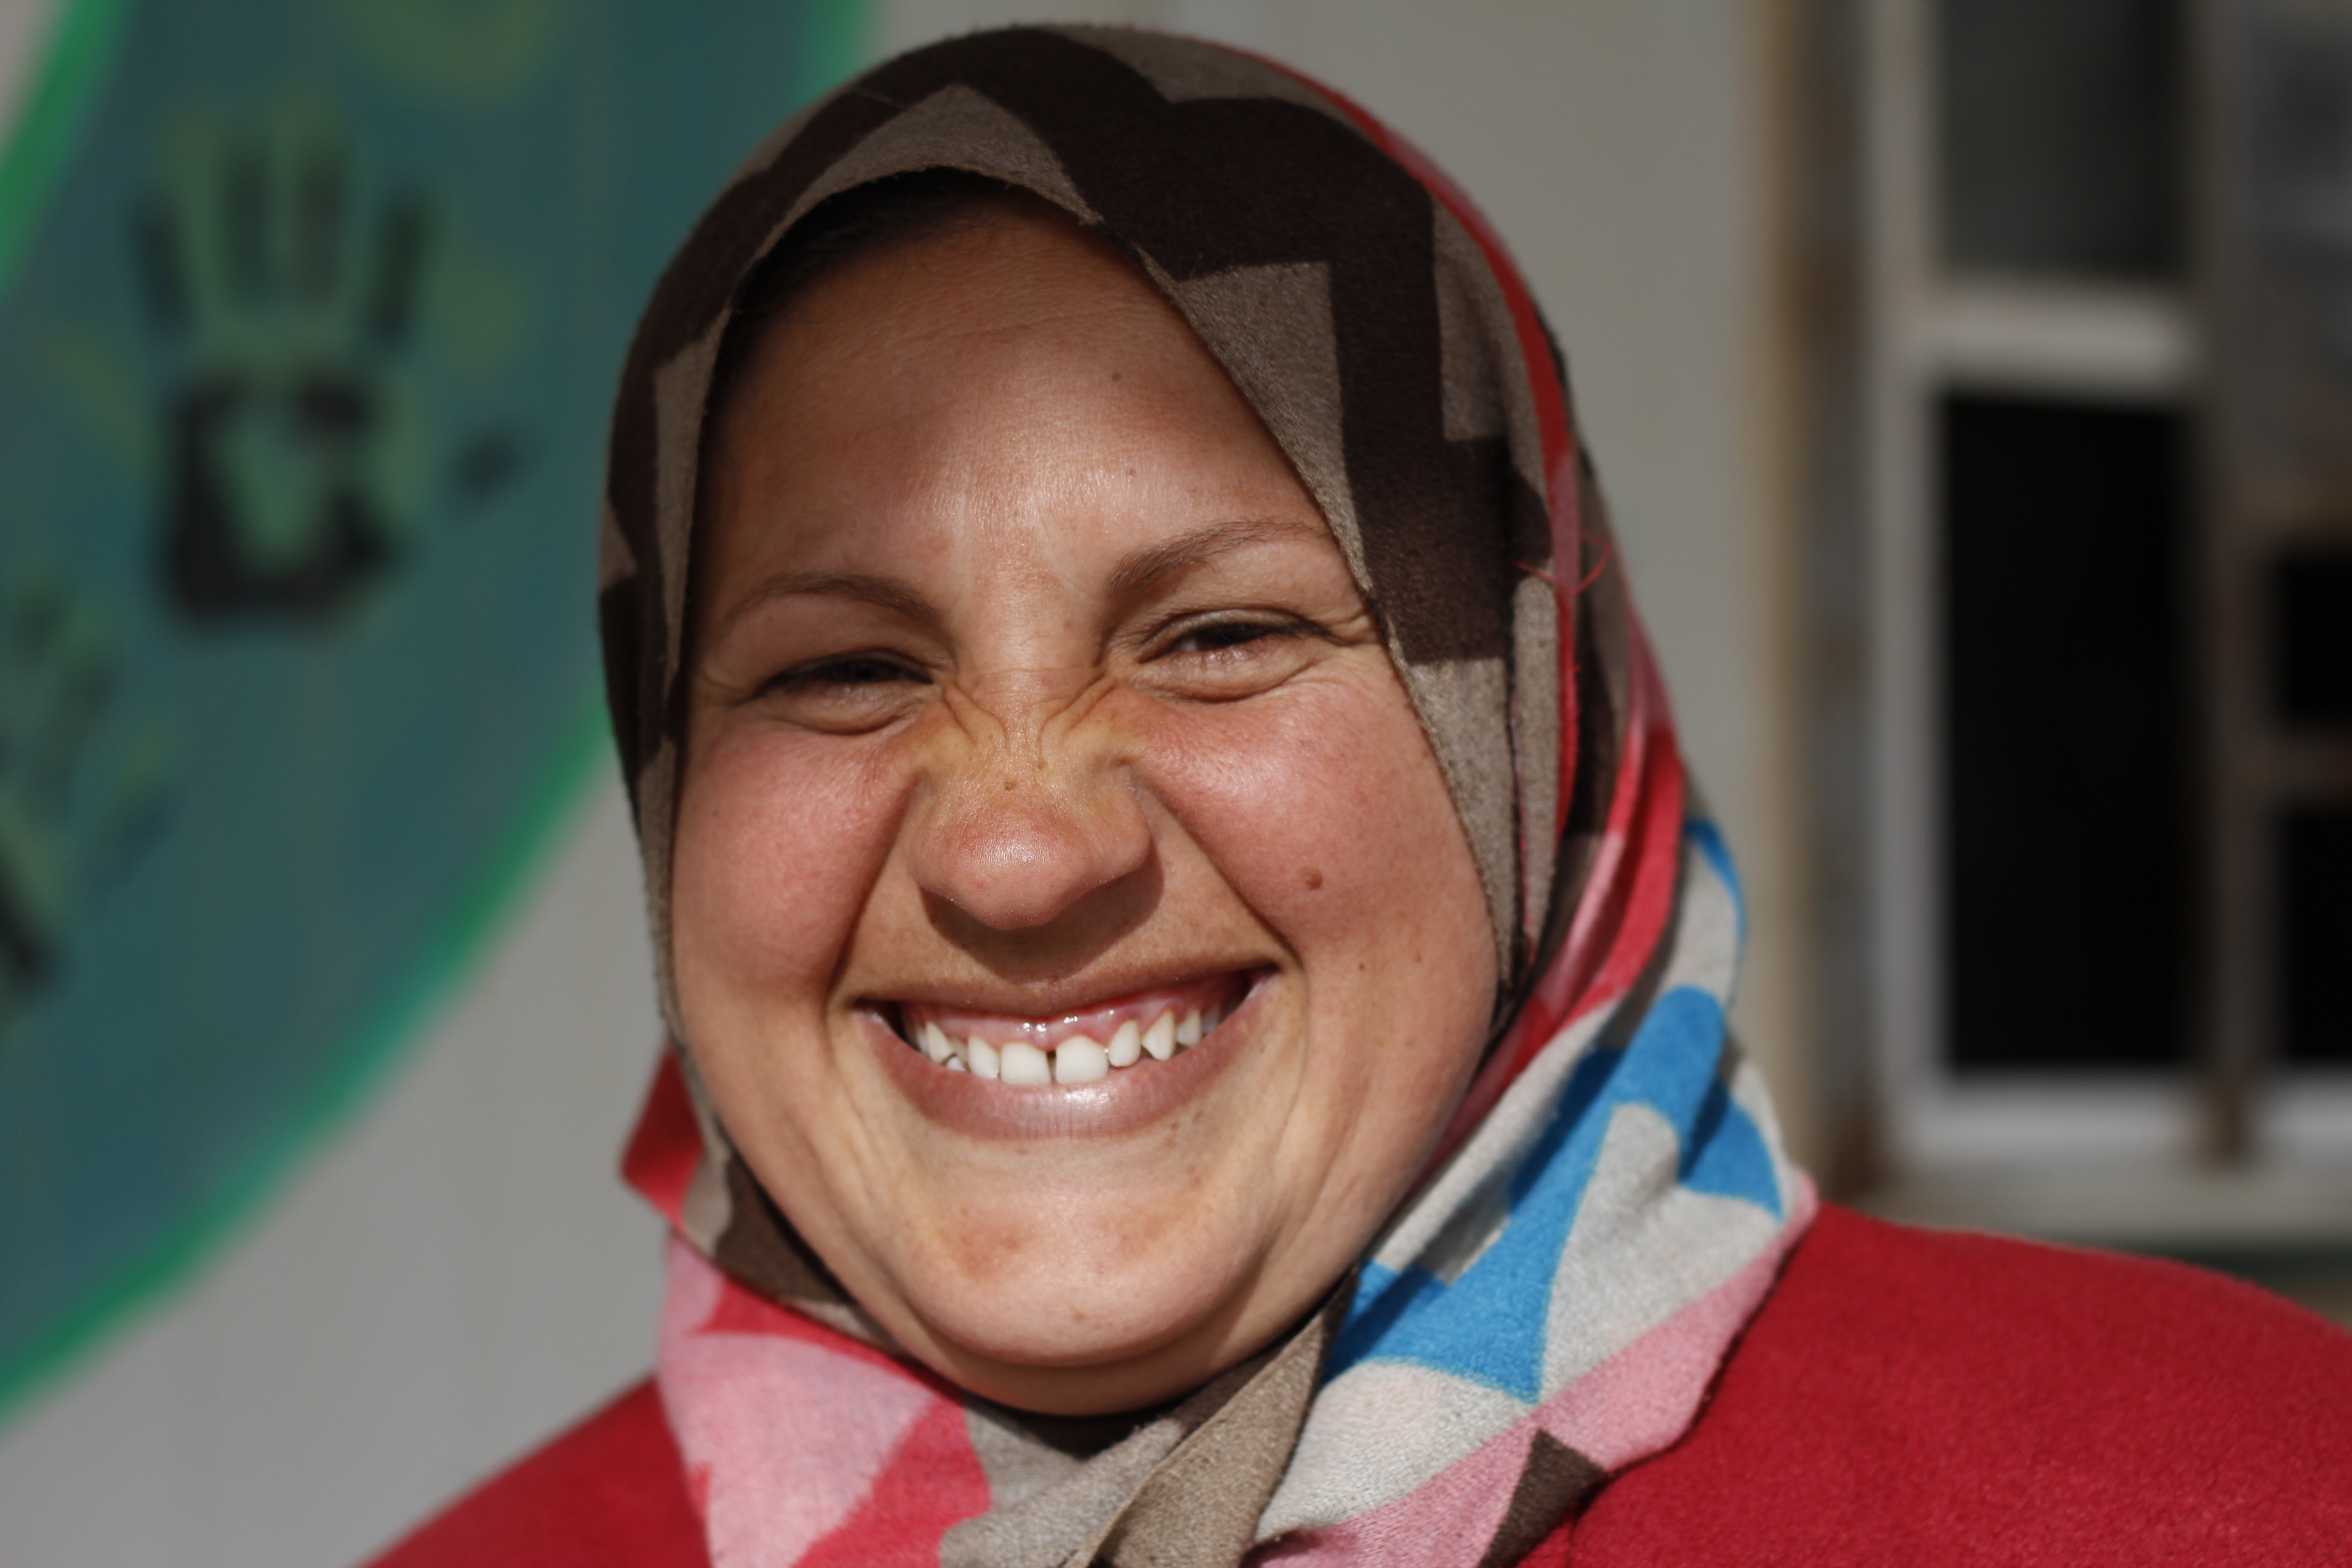 supportarefugee-irhlas-copyright-oxfam-gb